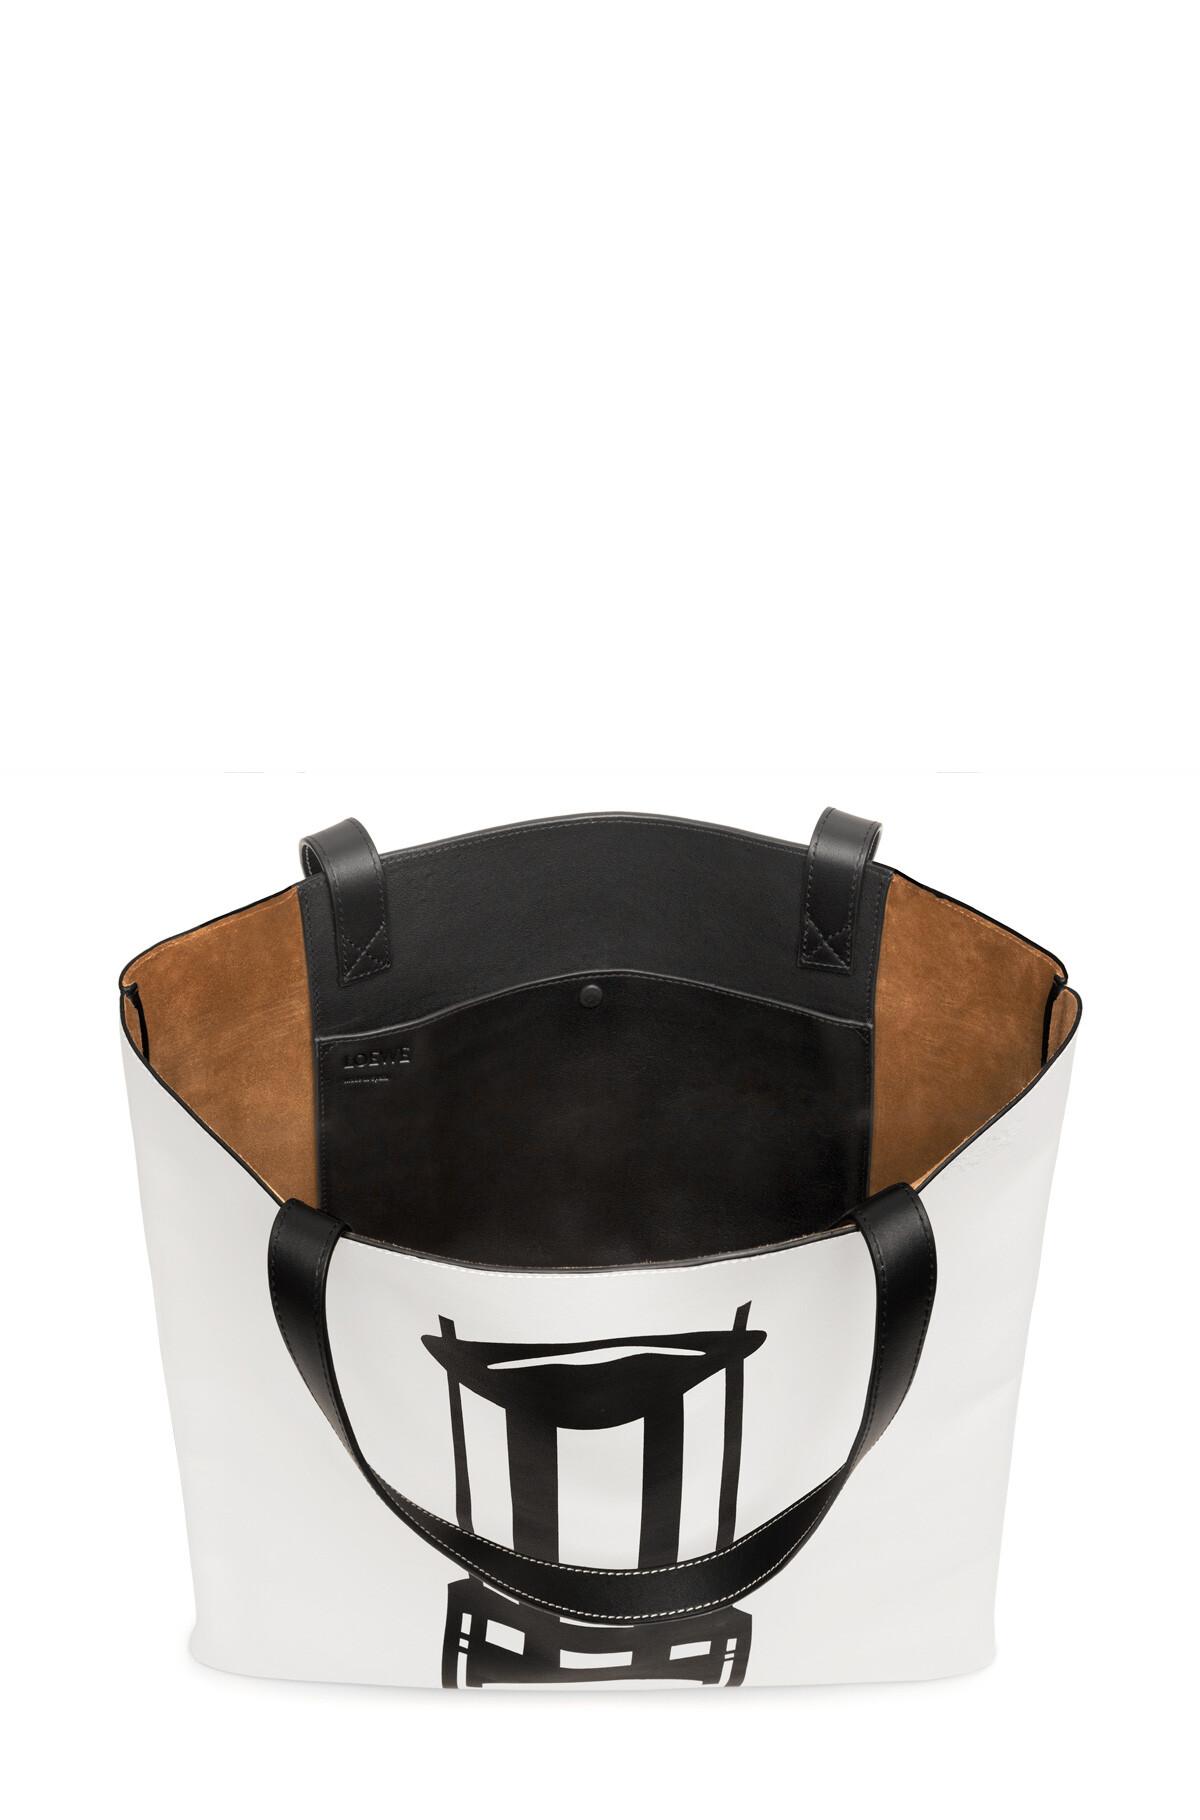 LOEWE Vertical Tote Chair Large Bag White/Black front